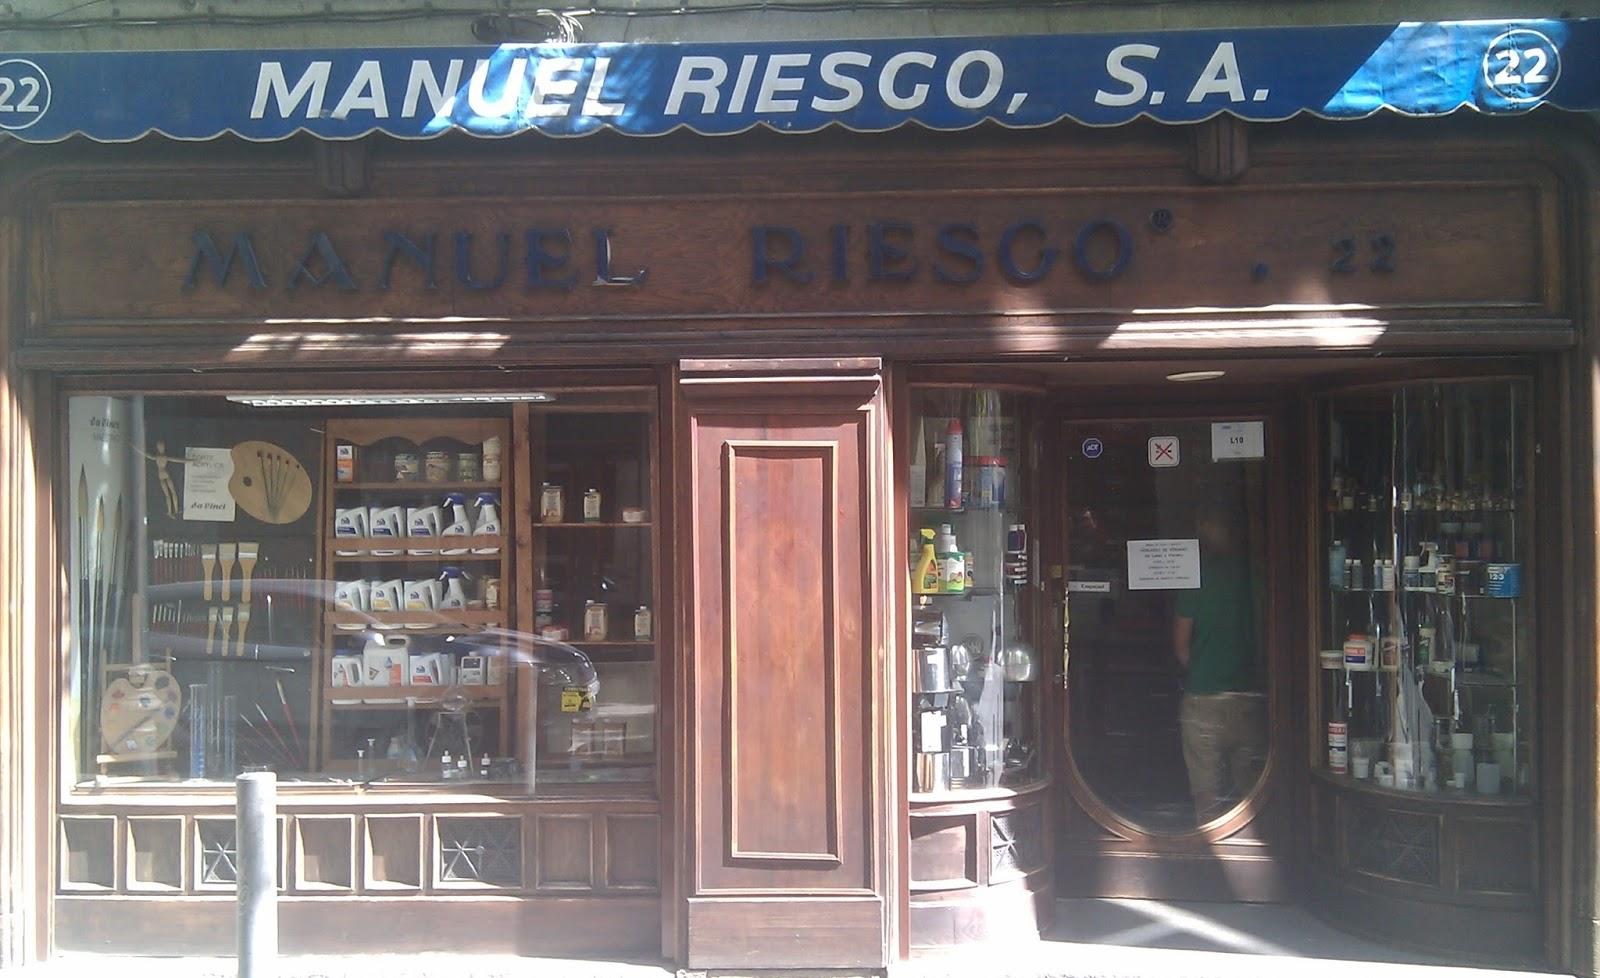 Le vetrine pi curiose di madrid lateatblog - Manuel riesgo villaverde ...